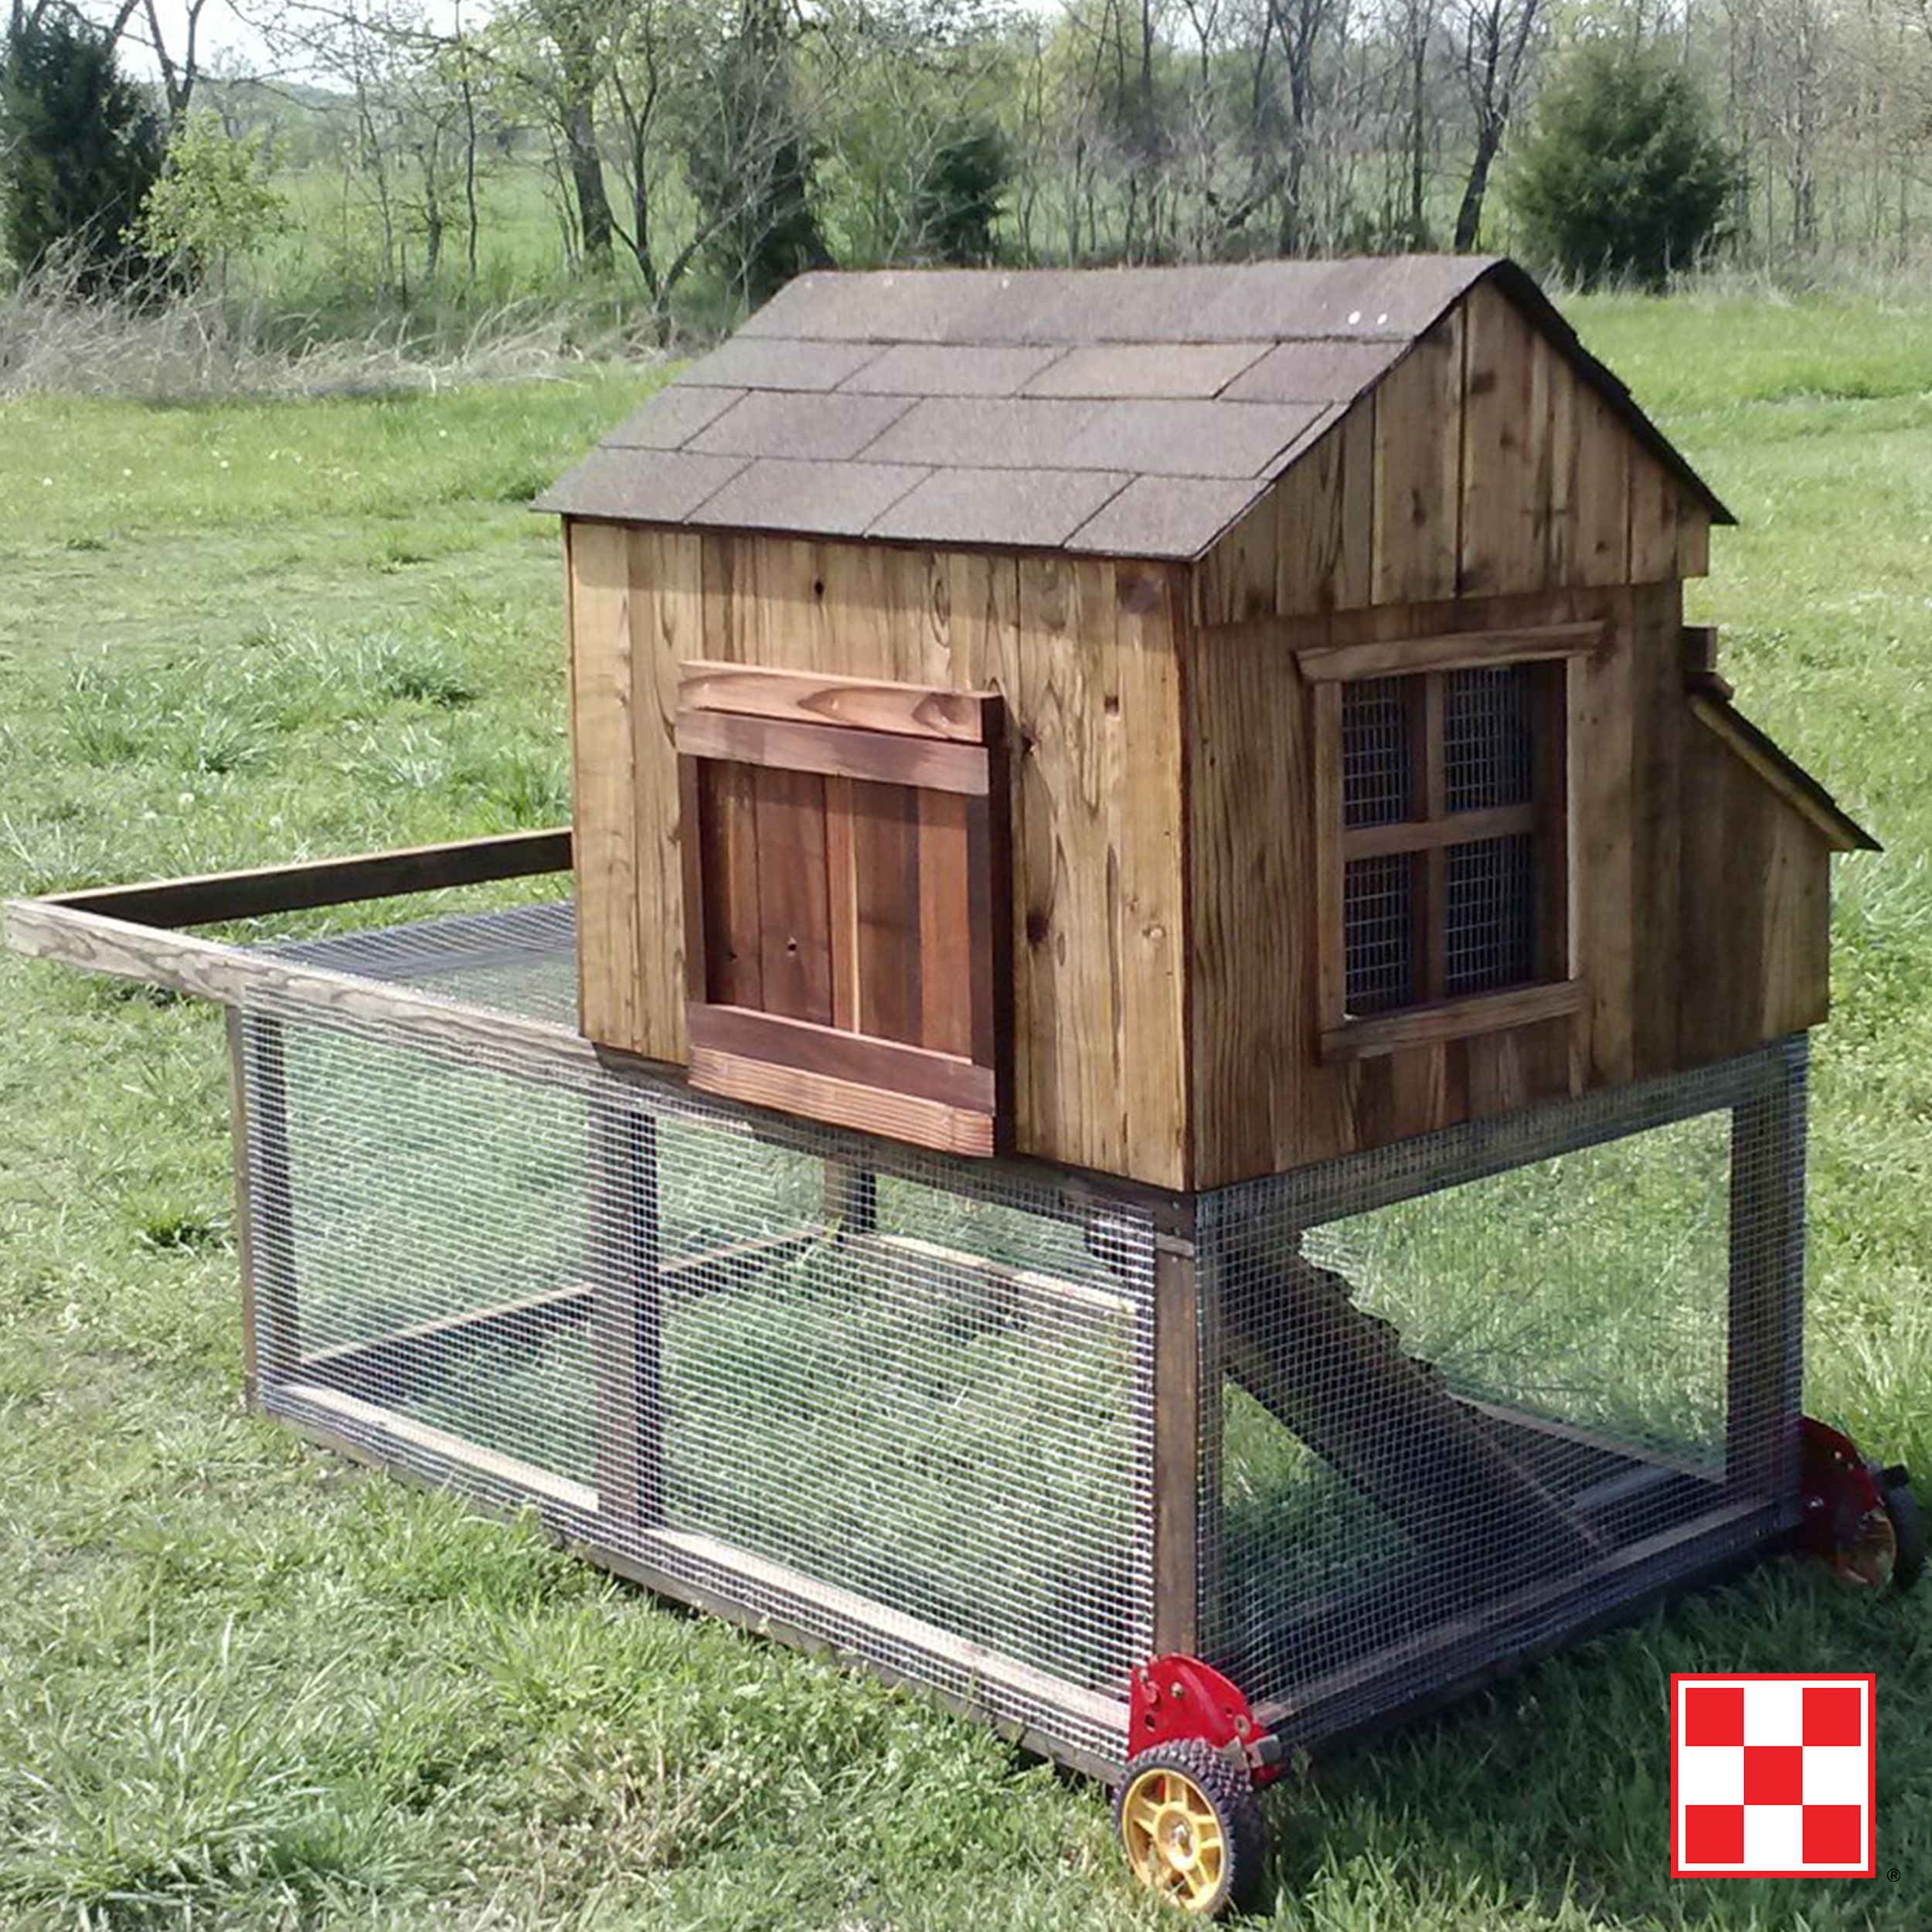 Building A Chicken Coop Backyard Coop Chickens Backyard